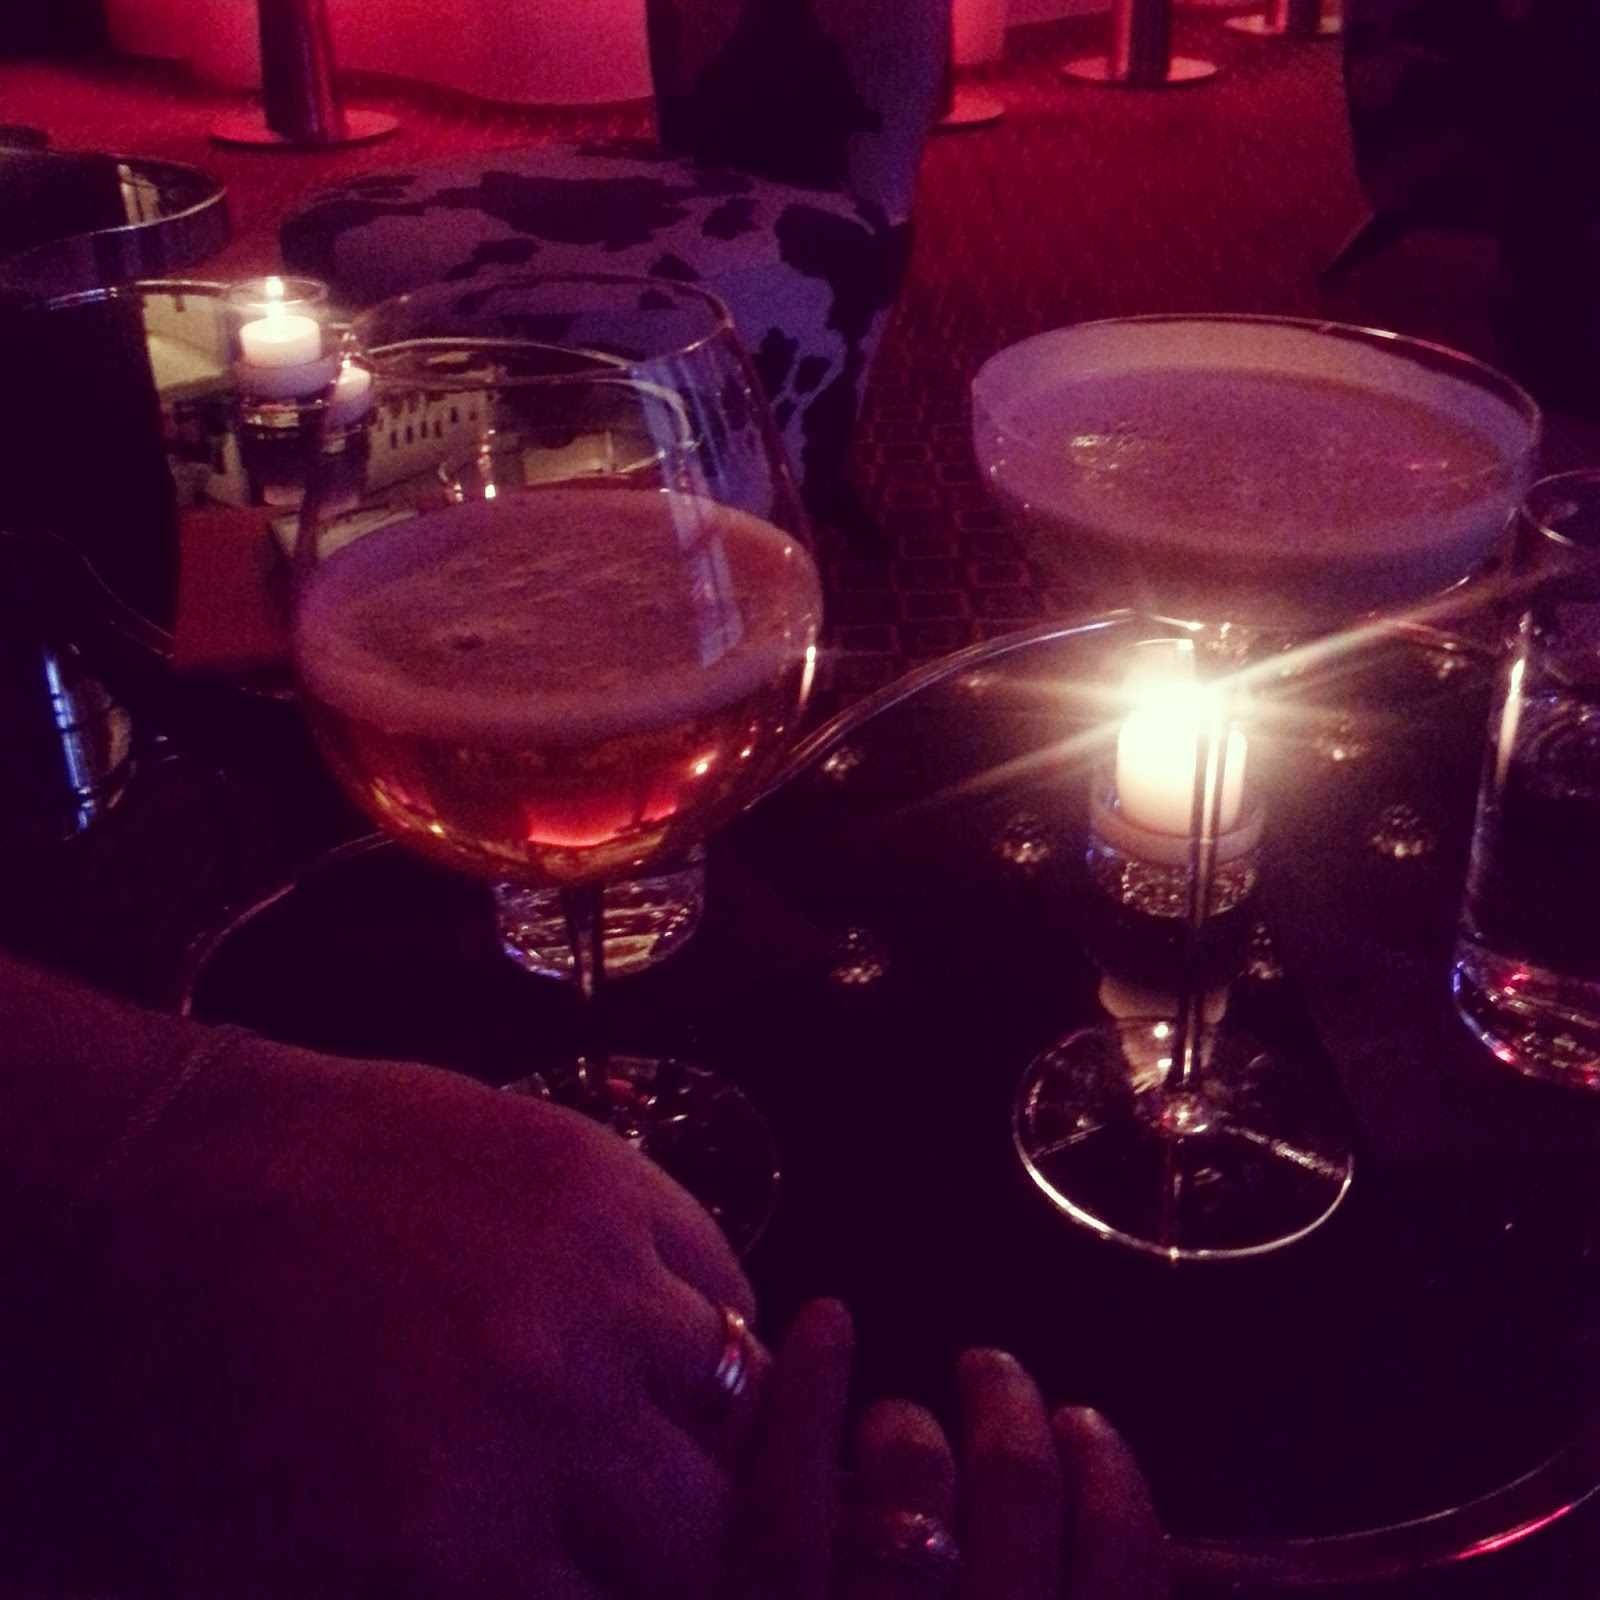 Drinks @ The Mark Hotel  |  Red-eyed revelry on afeathery*nest  |  http://afeatherynest.blospot.com